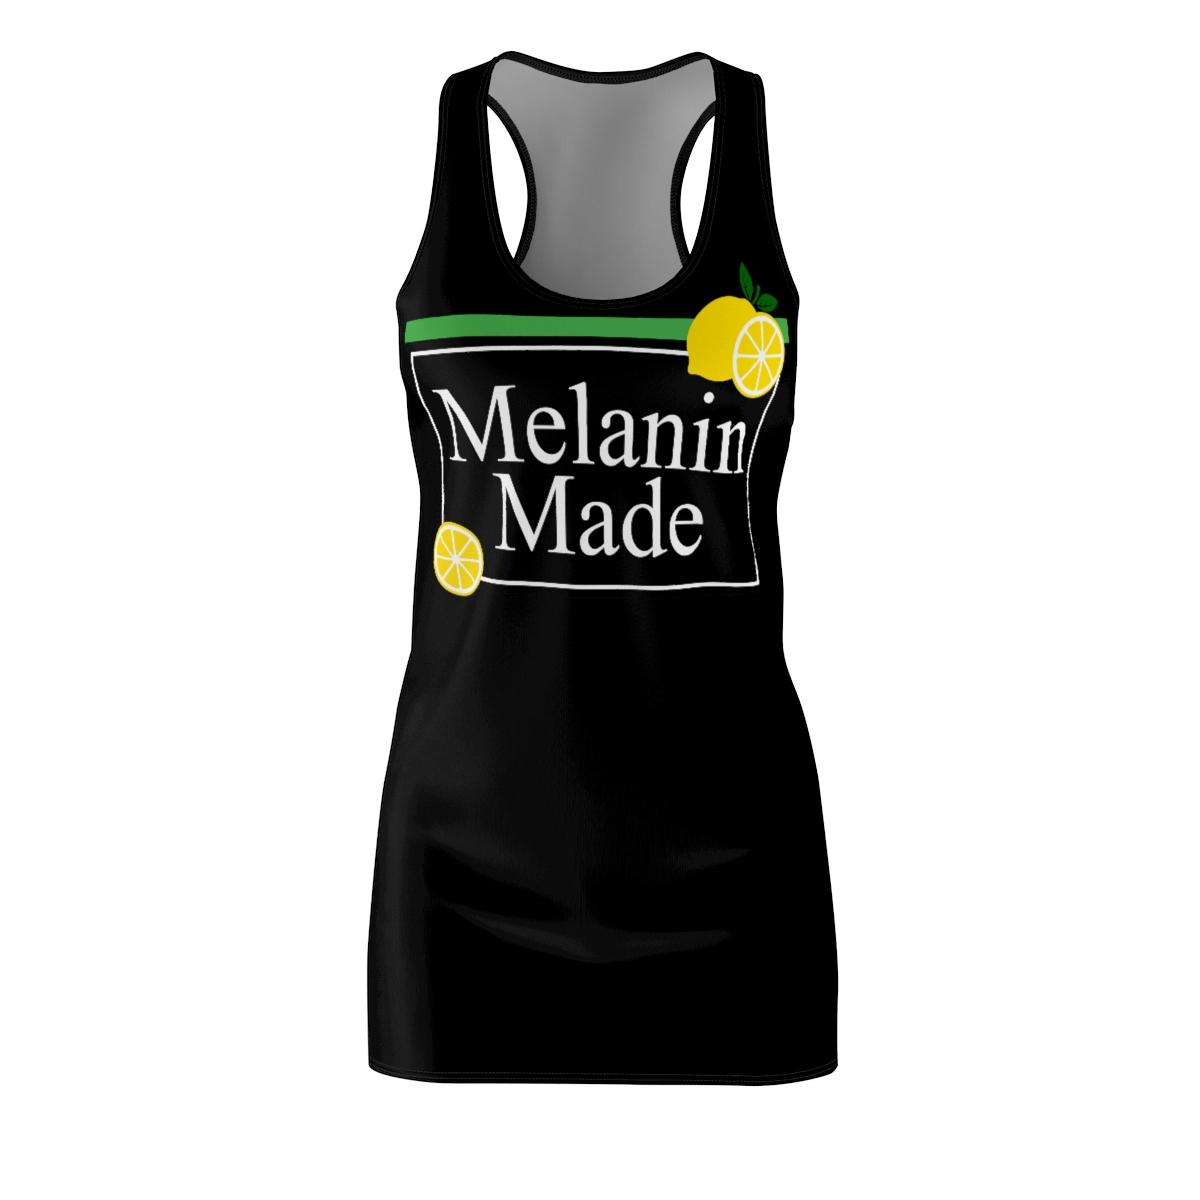 Melanin Made Tank Mini Dress For Teens and Women